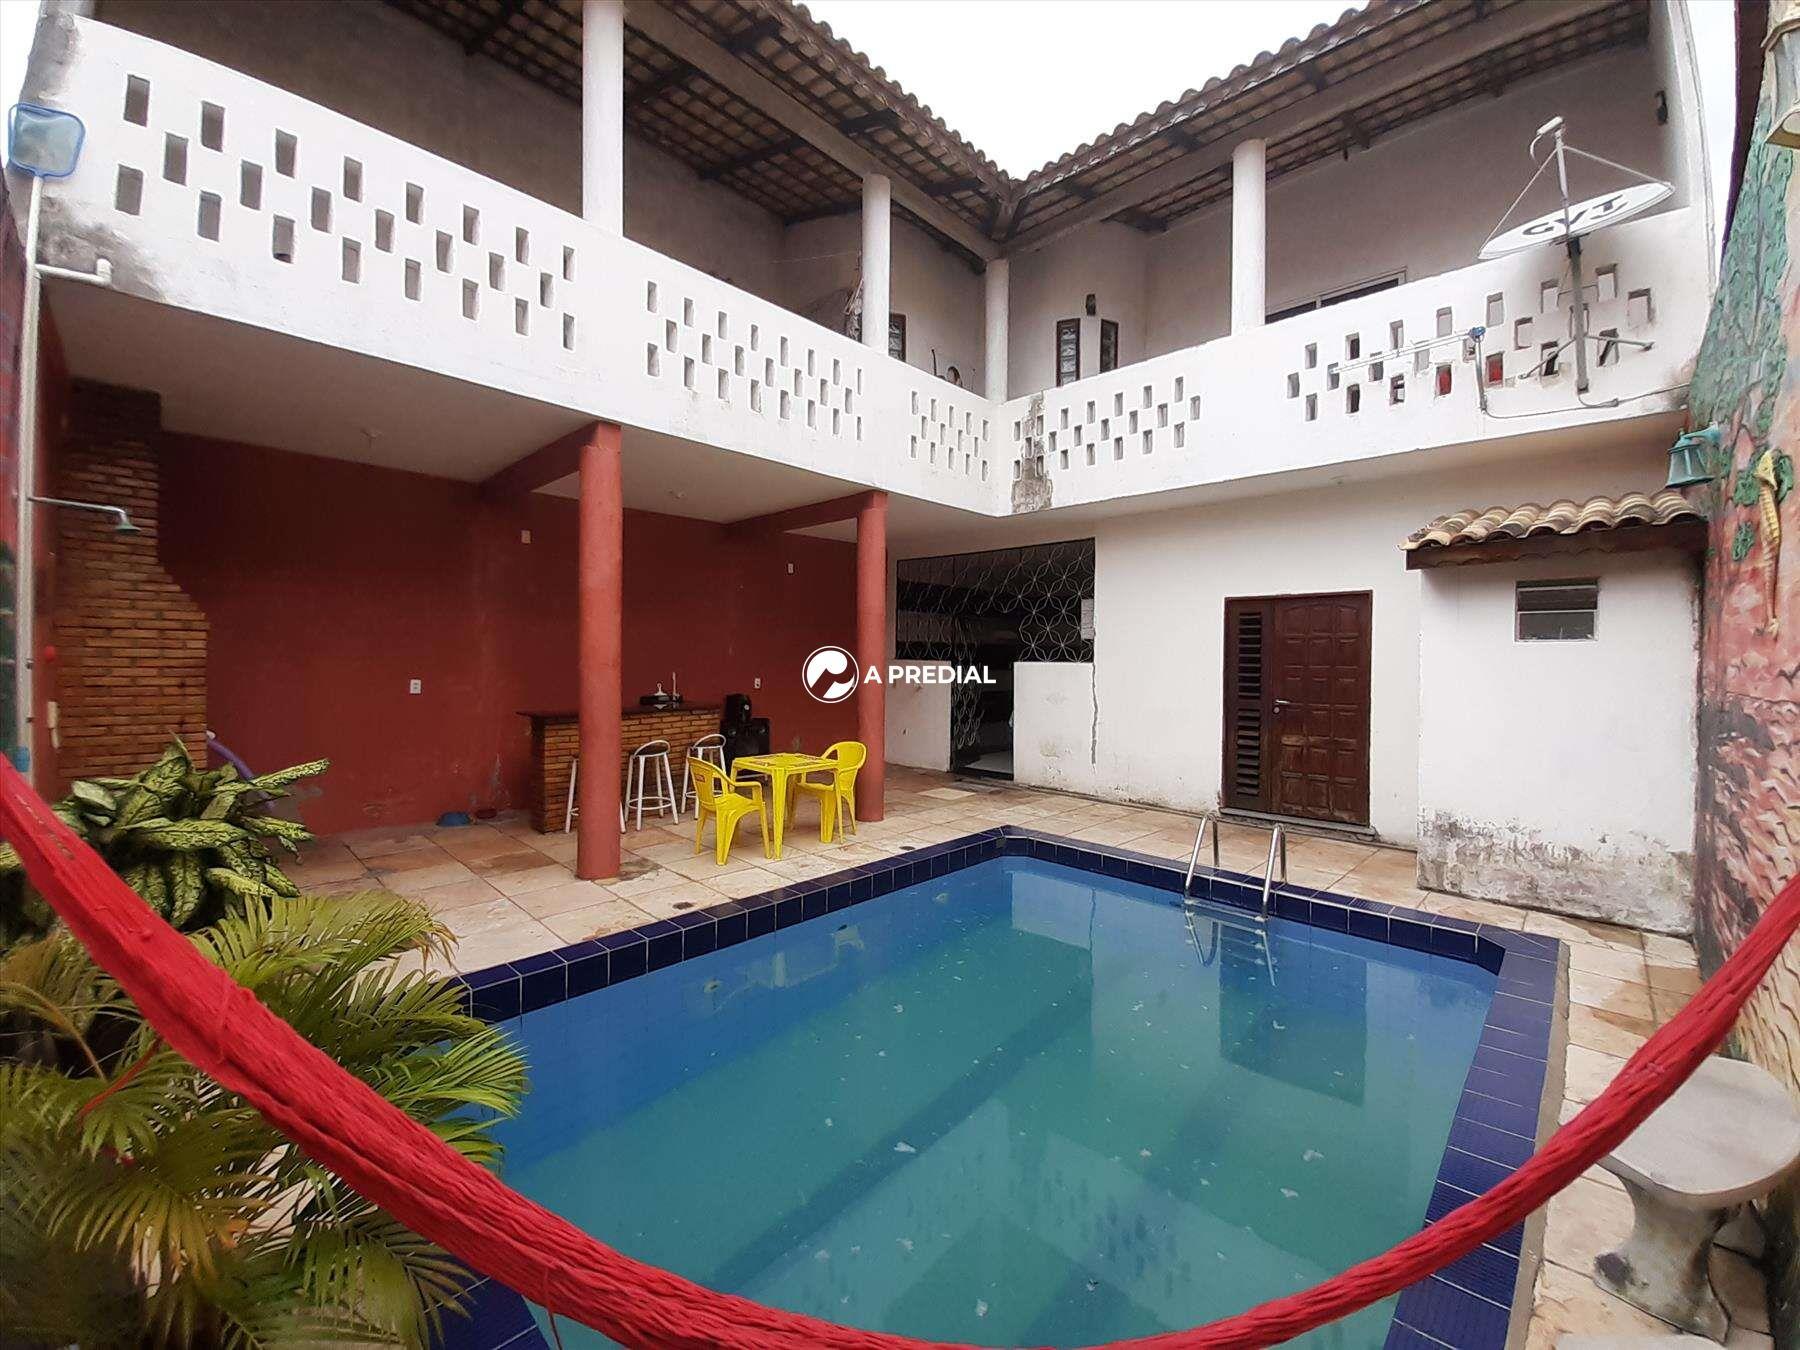 Casa à venda no Prefeito José Walter: 9f12b534-f-20200718_122348.jpg